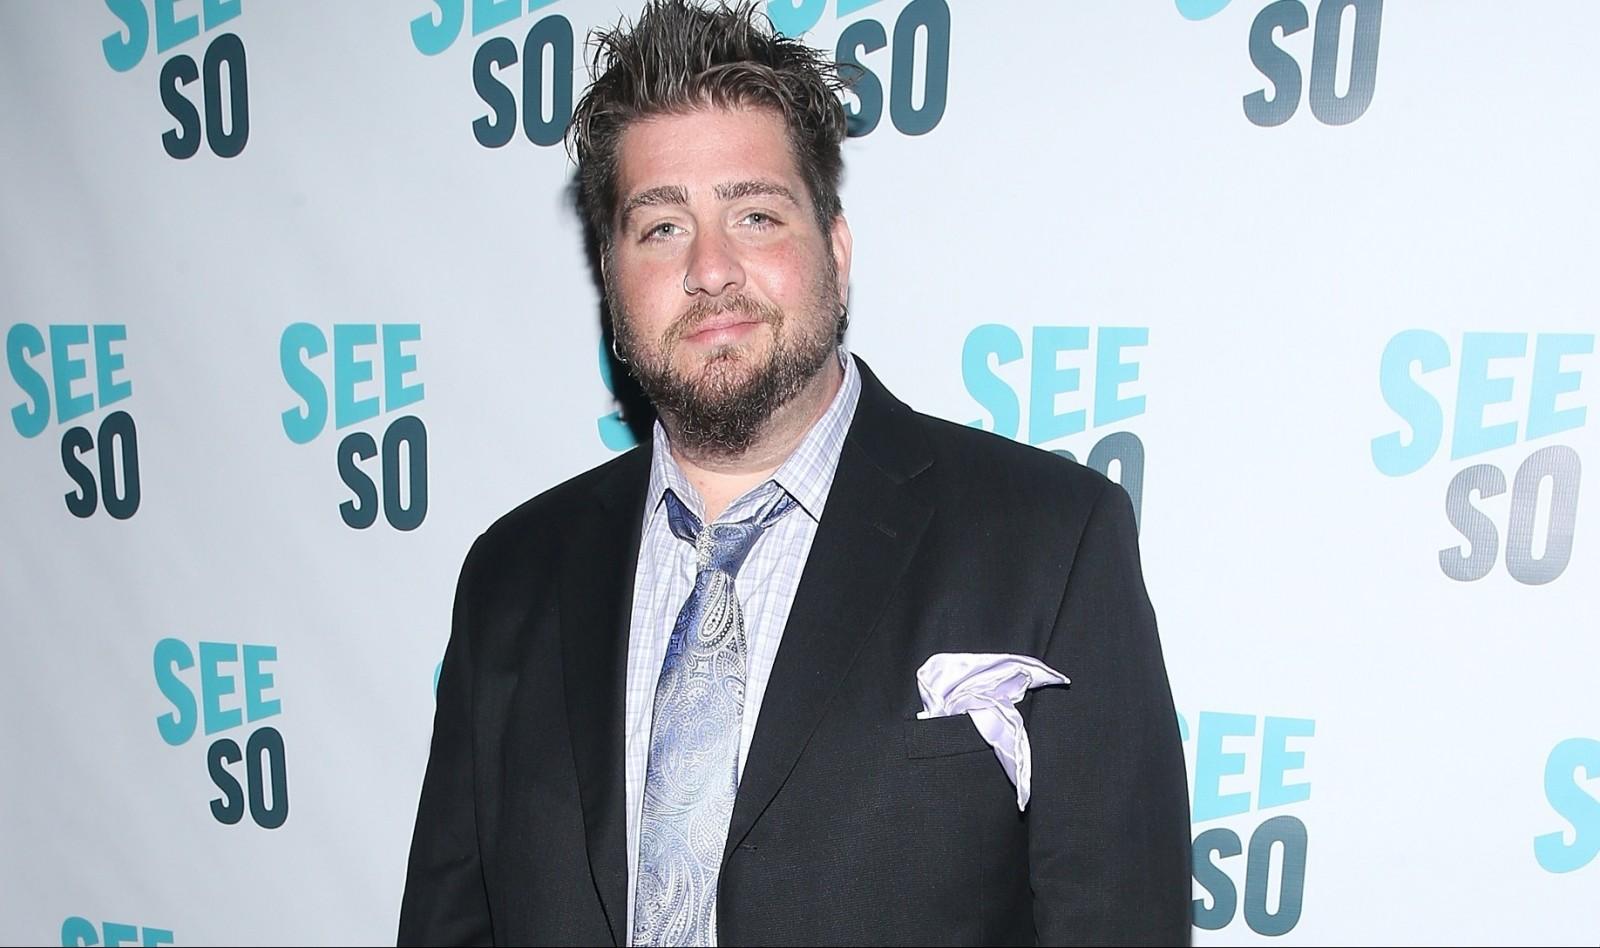 Jay Oakerson will perform at the Bear's Den in the Seneca Niagara Casino.